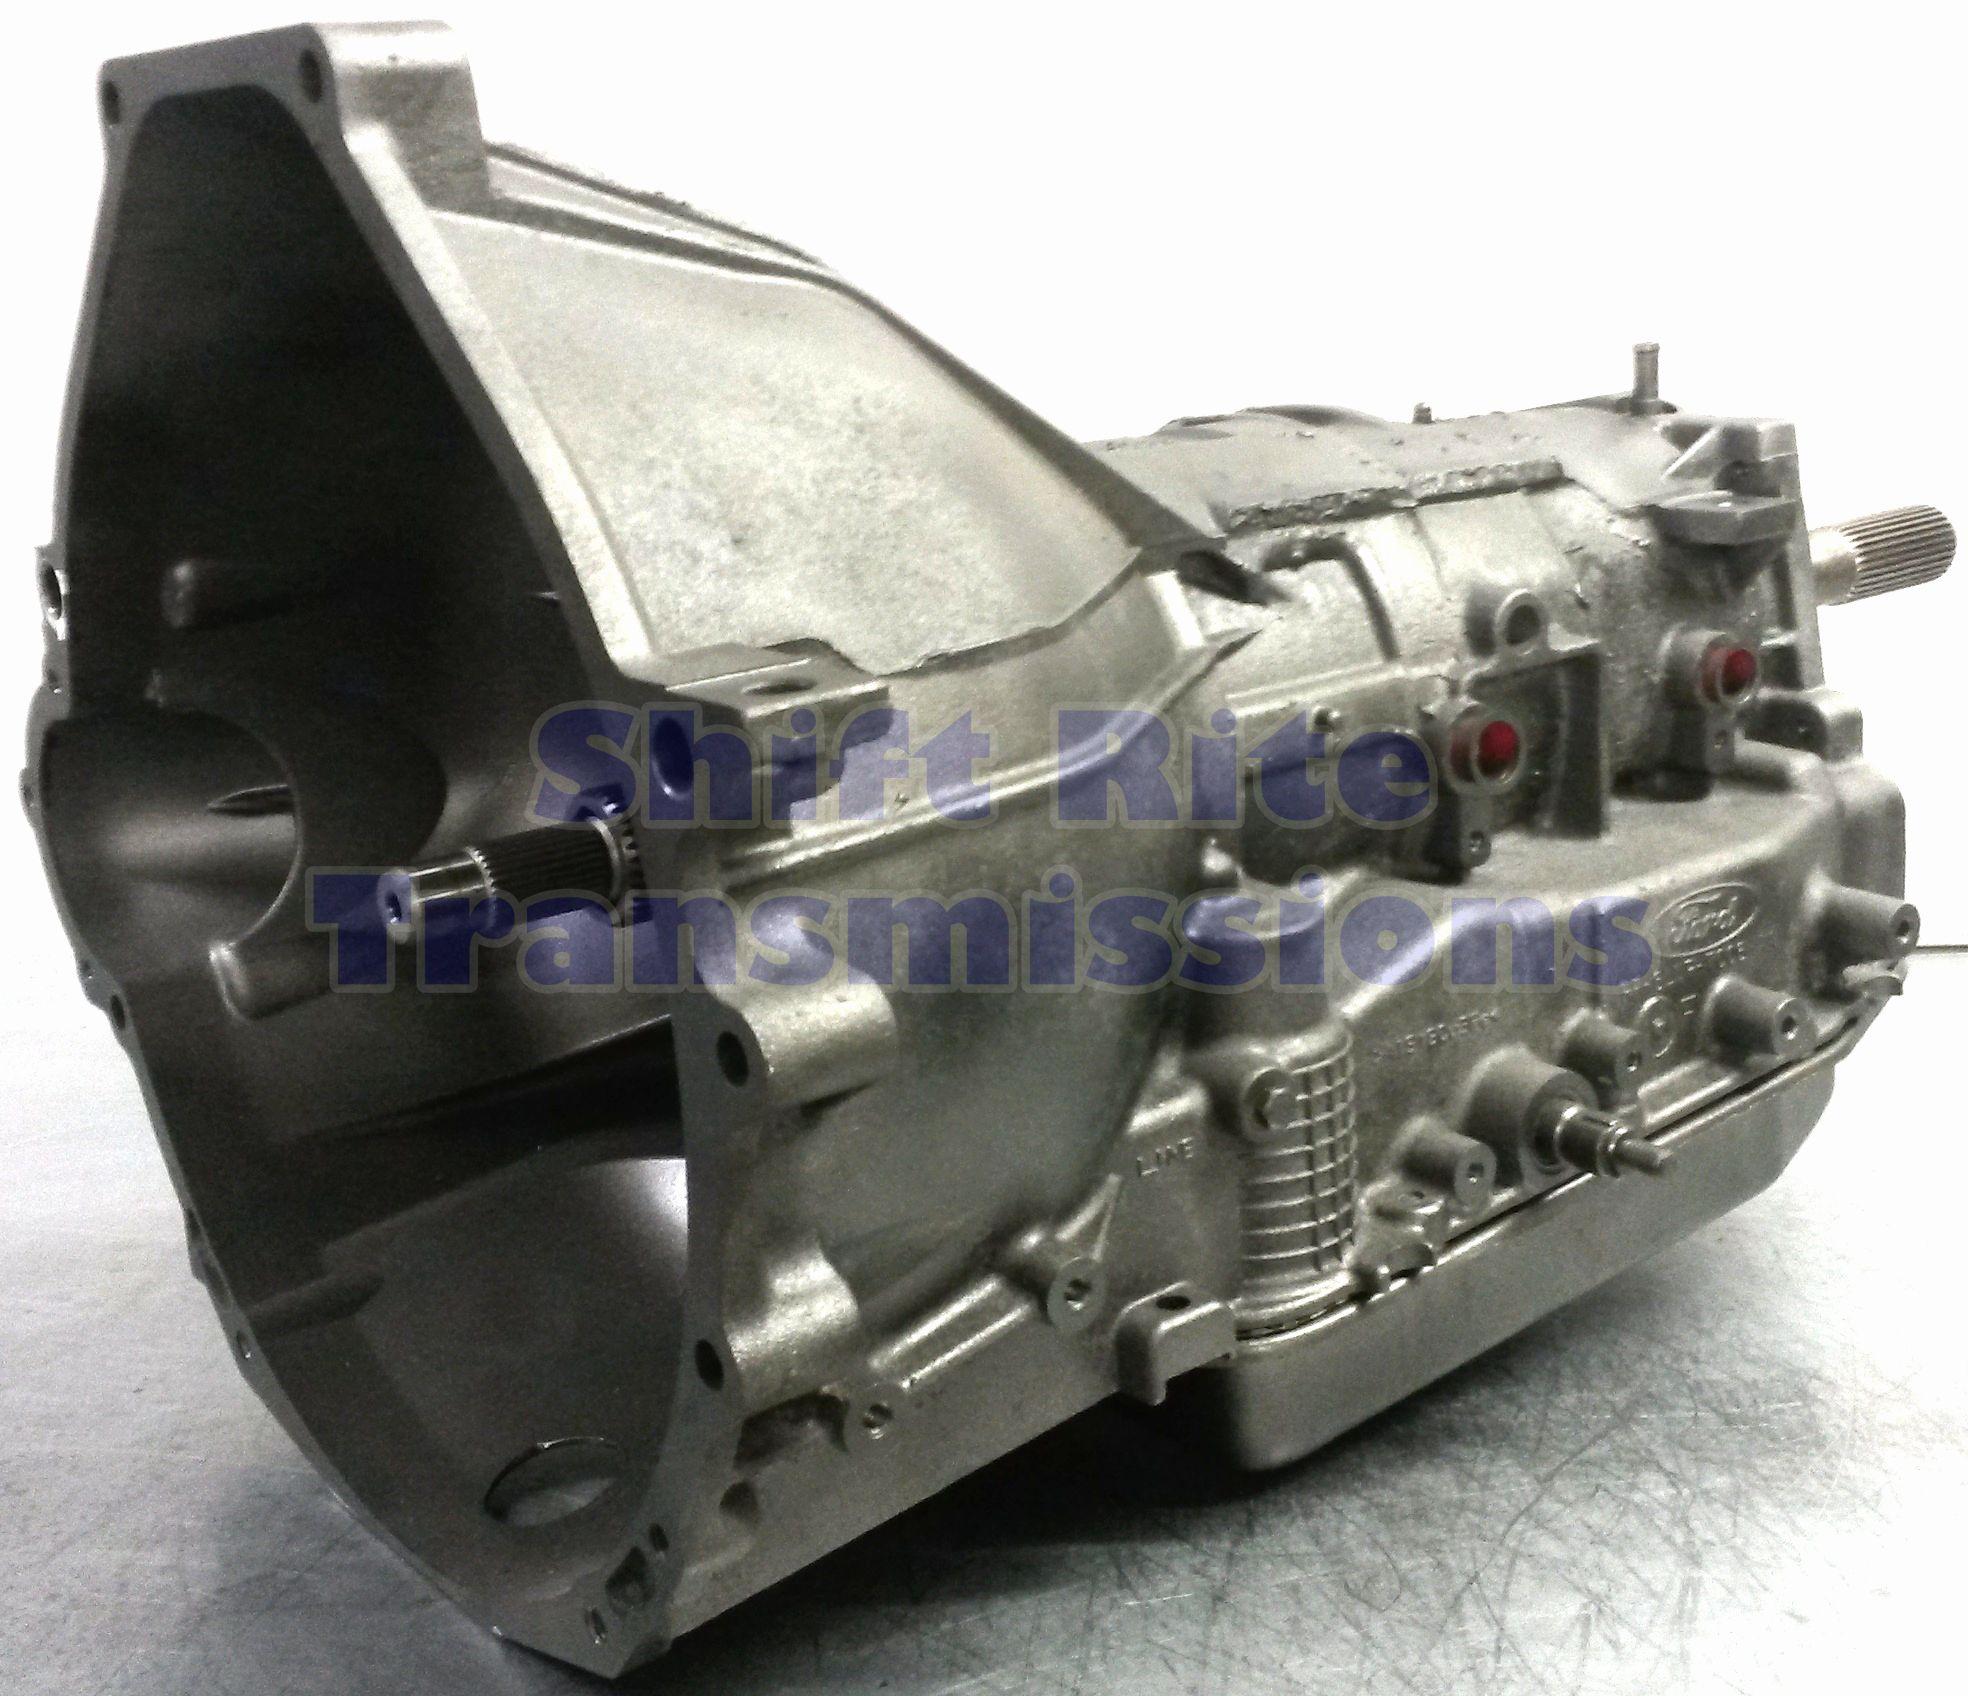 4R70W 1997 2WD TRANSMISSION 4.2L